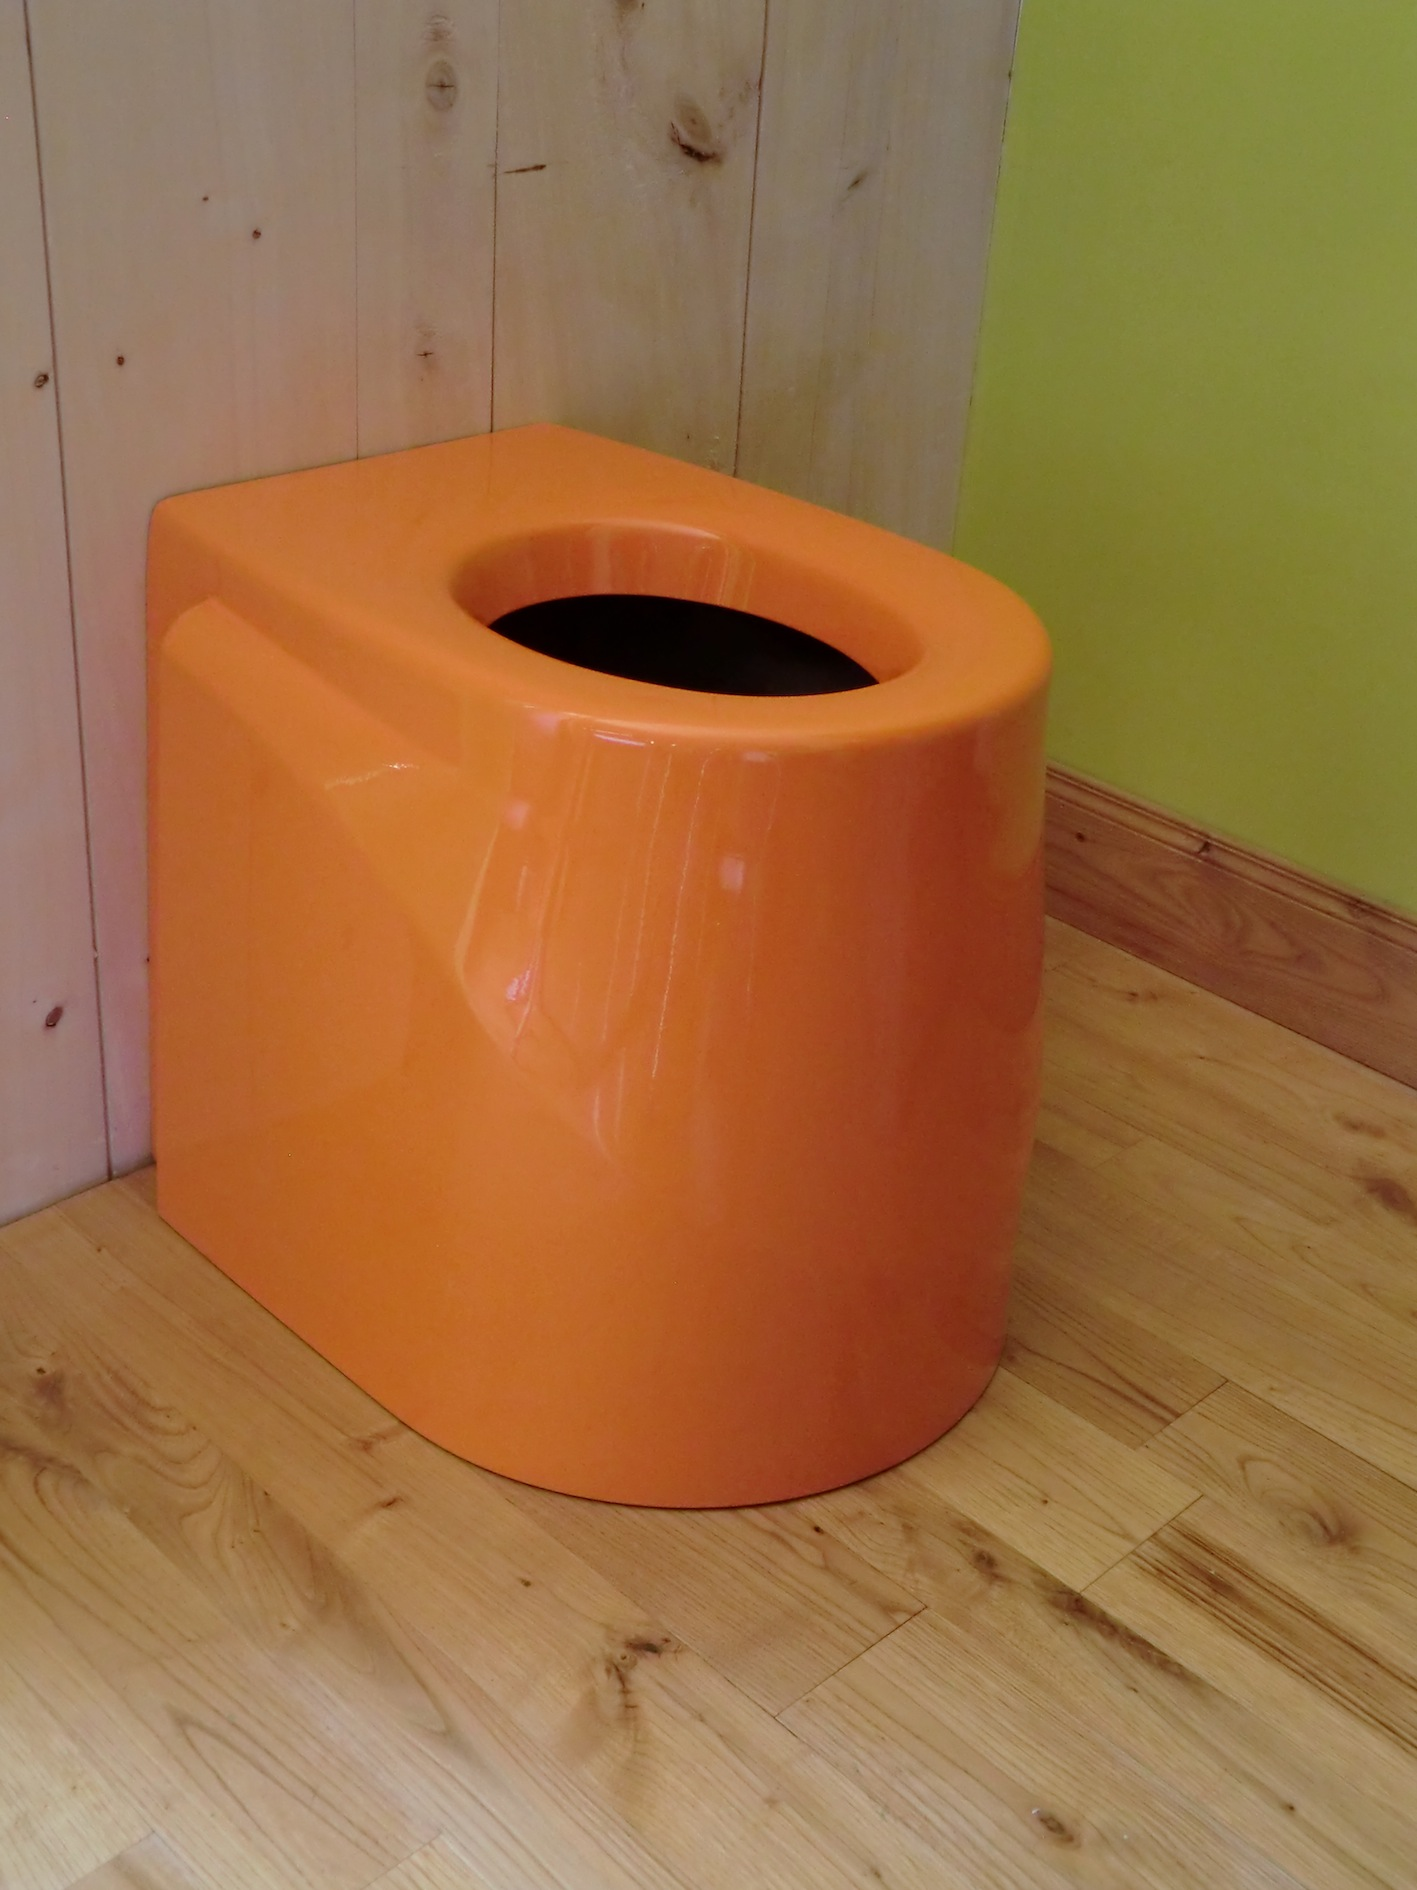 Toilette sèche Ecodomeo Néodyme orange 2